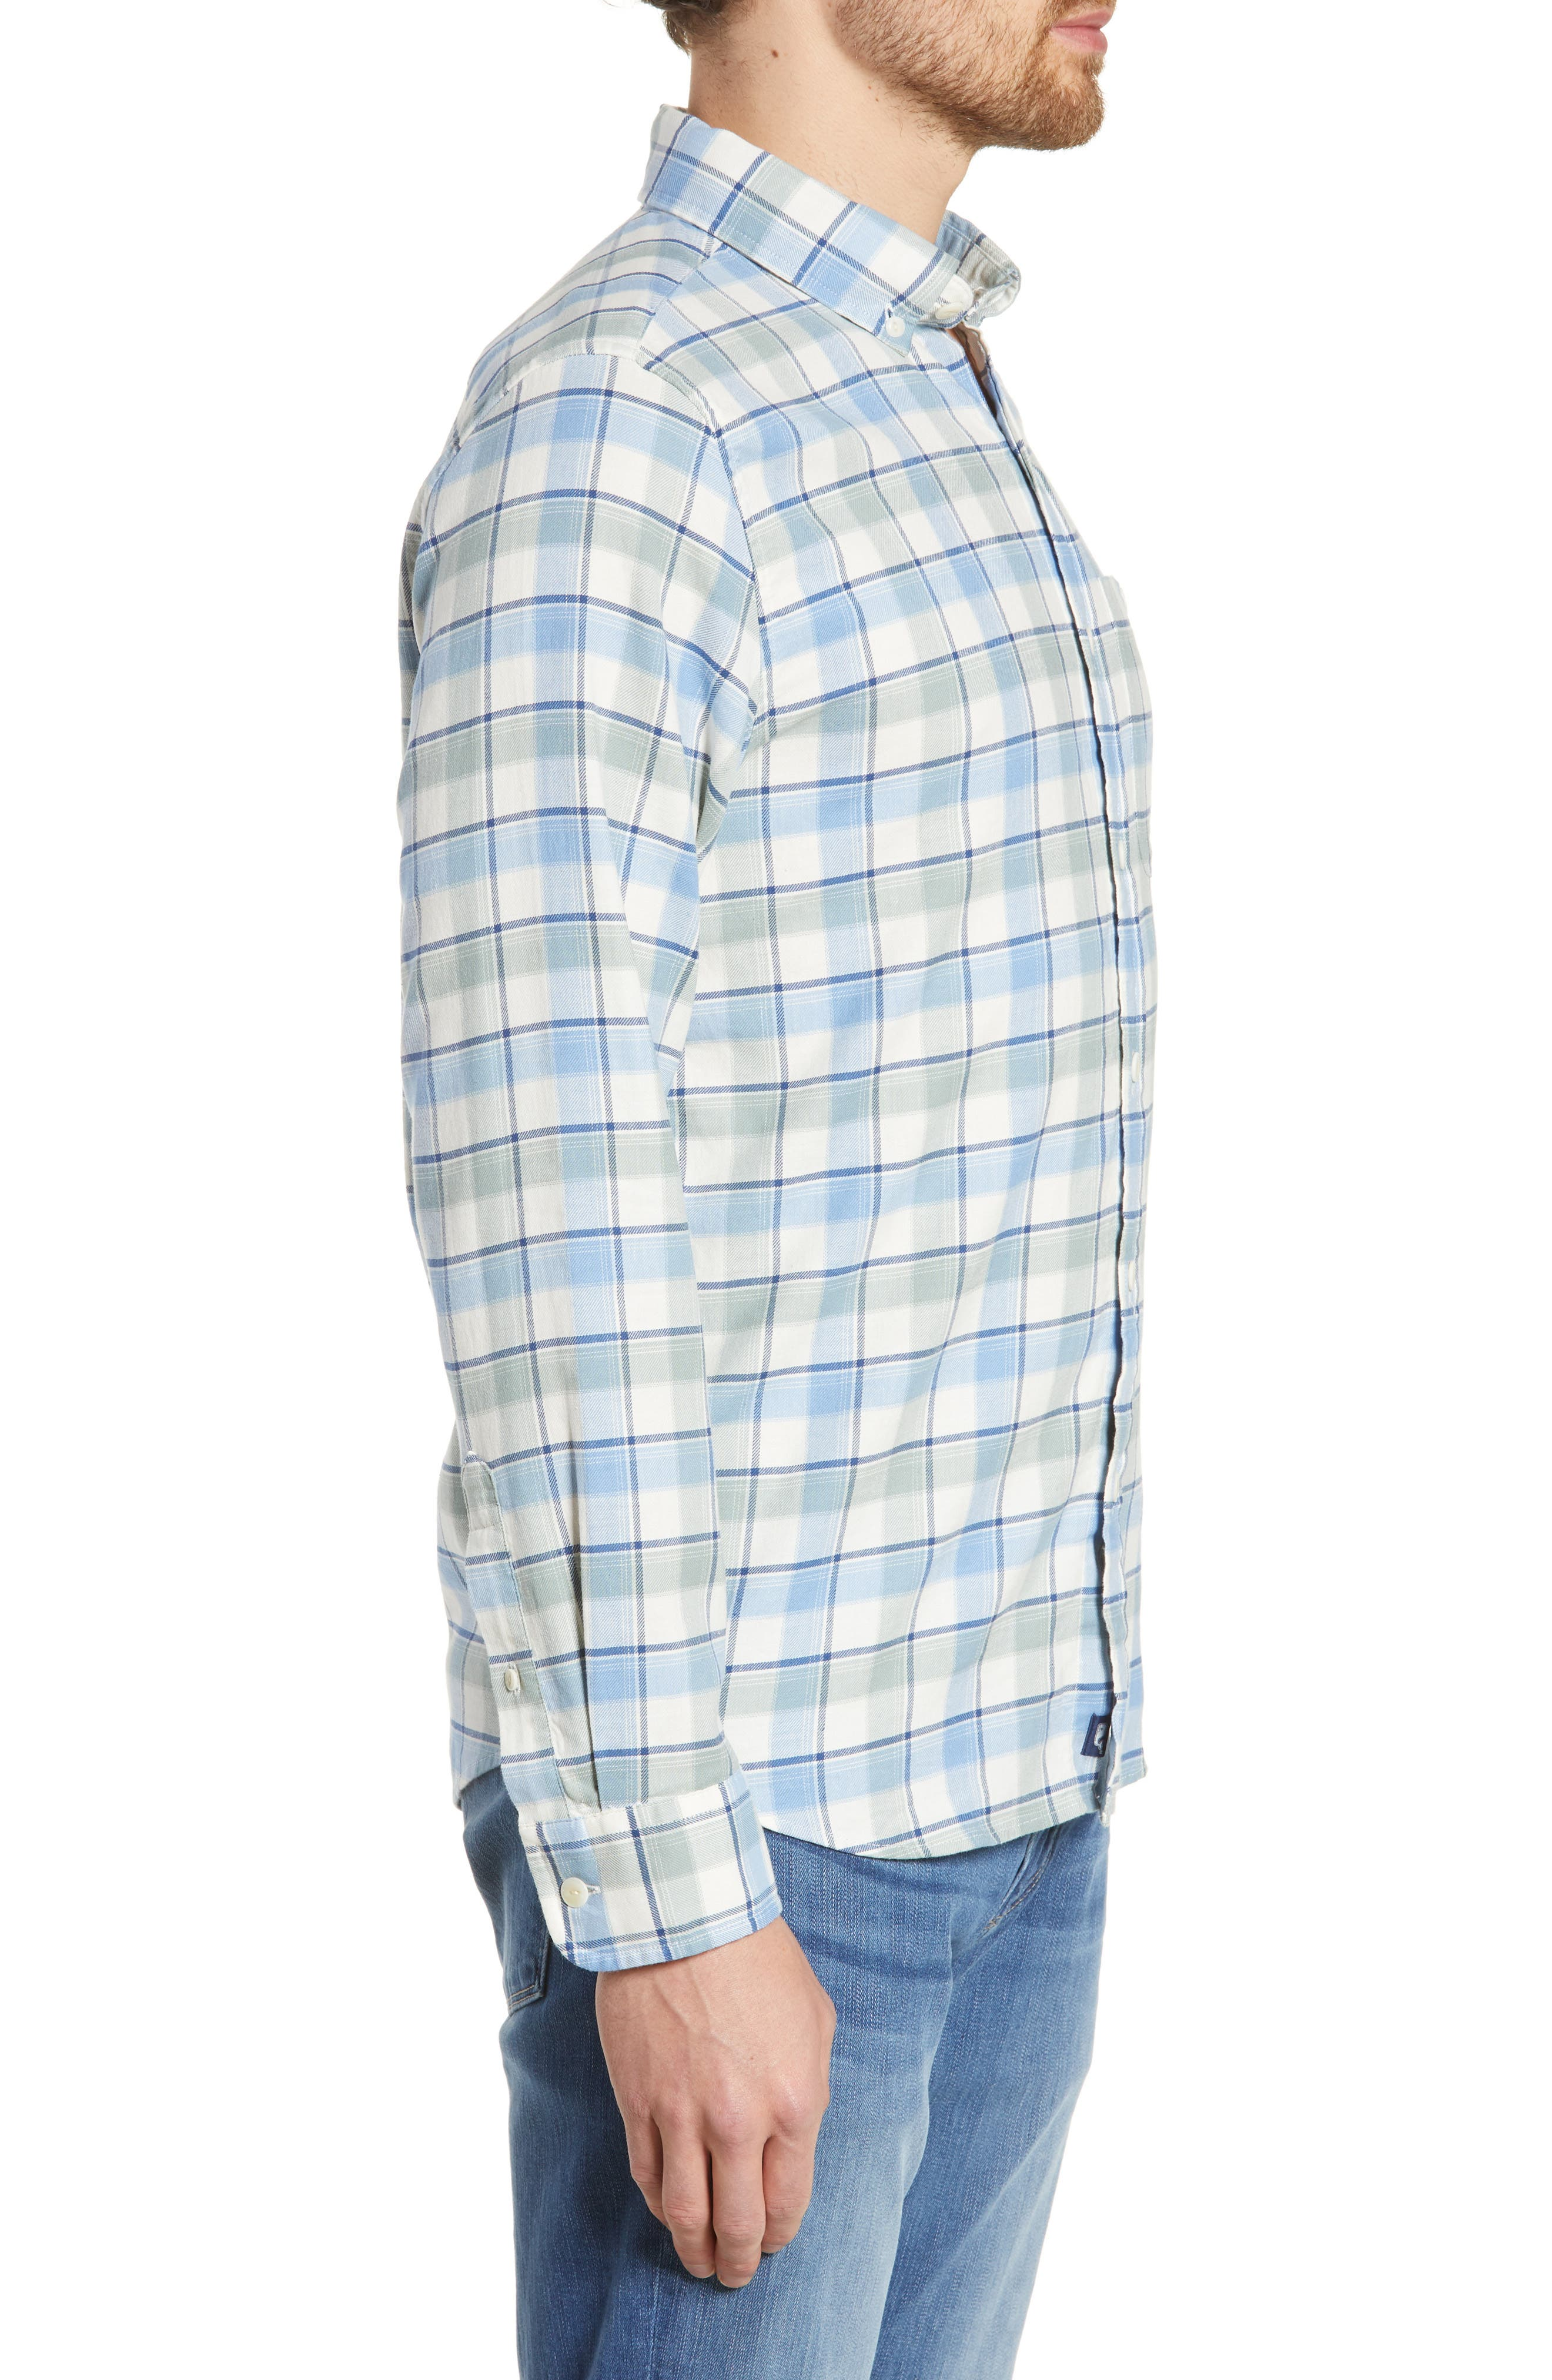 VINEYARD VINES,                             Bayside Slim Fit Plaid Sport Shirt,                             Alternate thumbnail 4, color,                             LIGHT SAGE